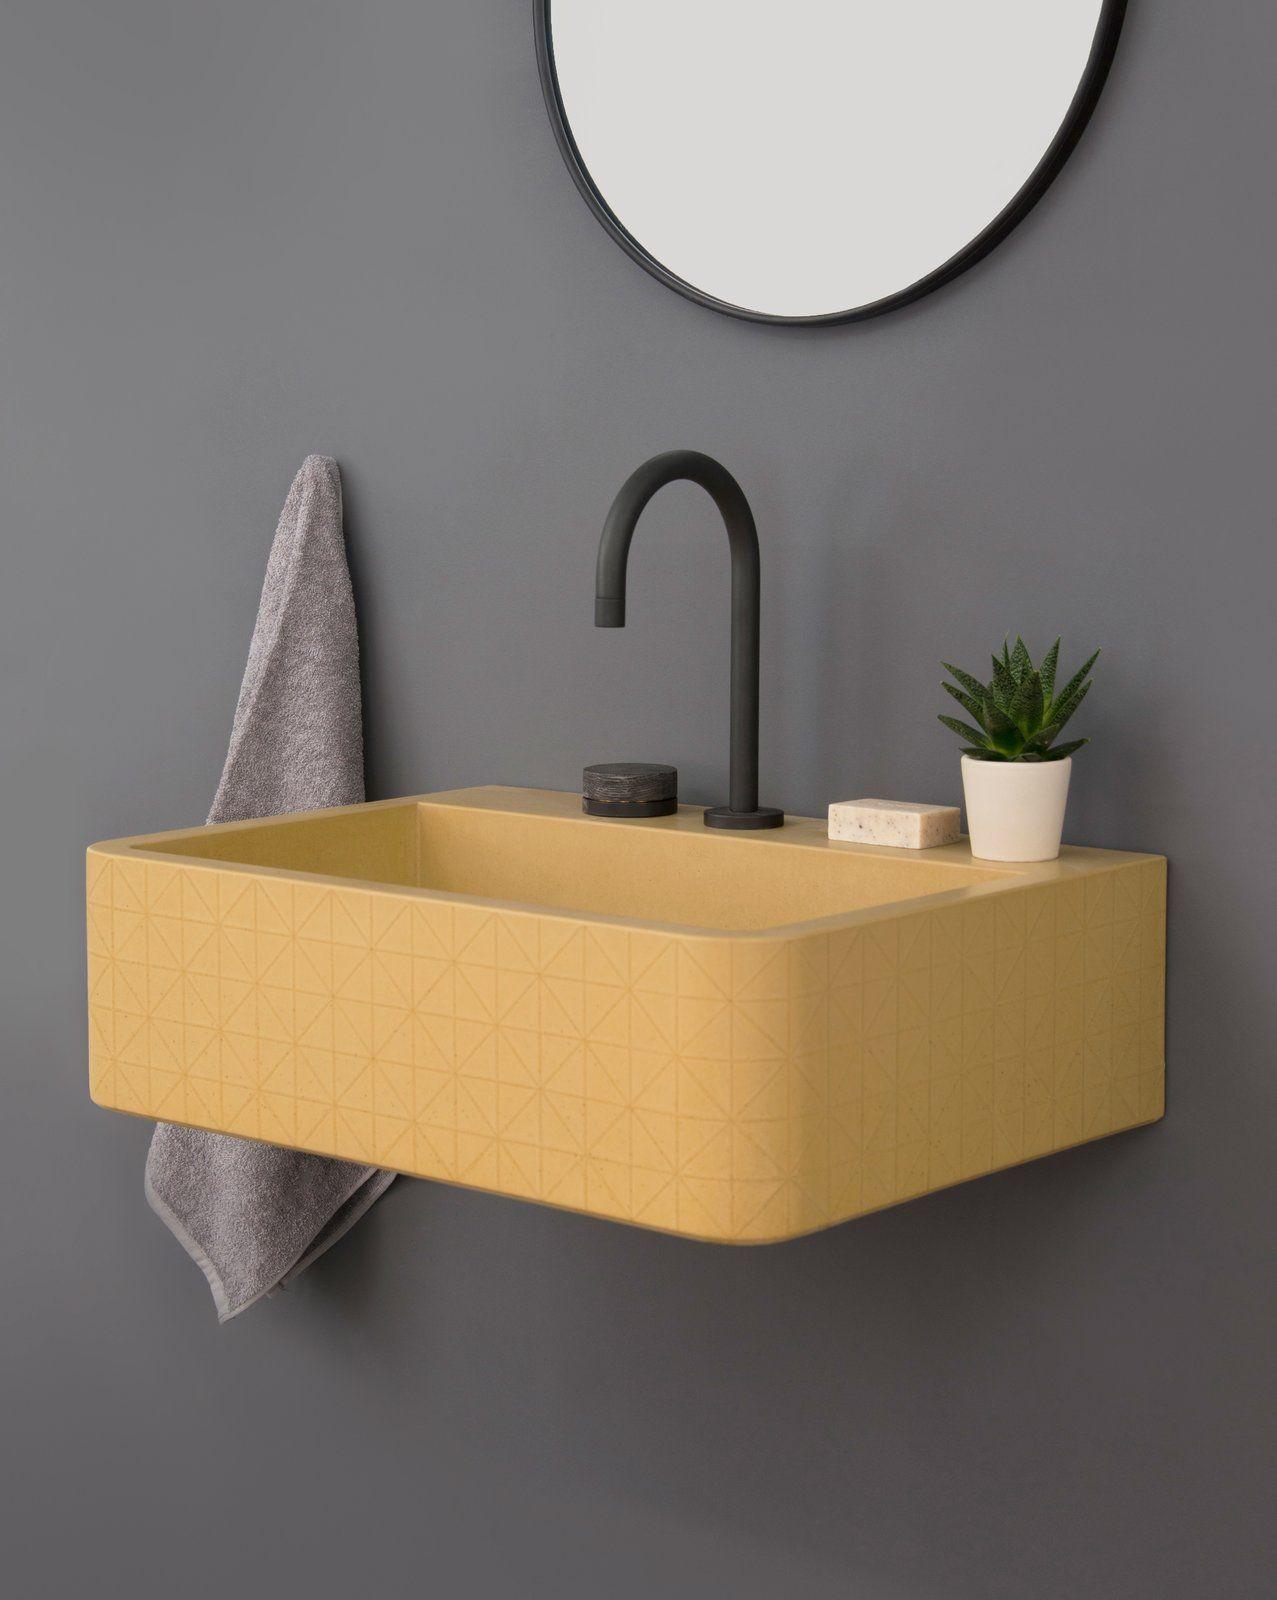 Photo of 2019 Modern Bathroom Fixture Trend: Bold, Retro Colors